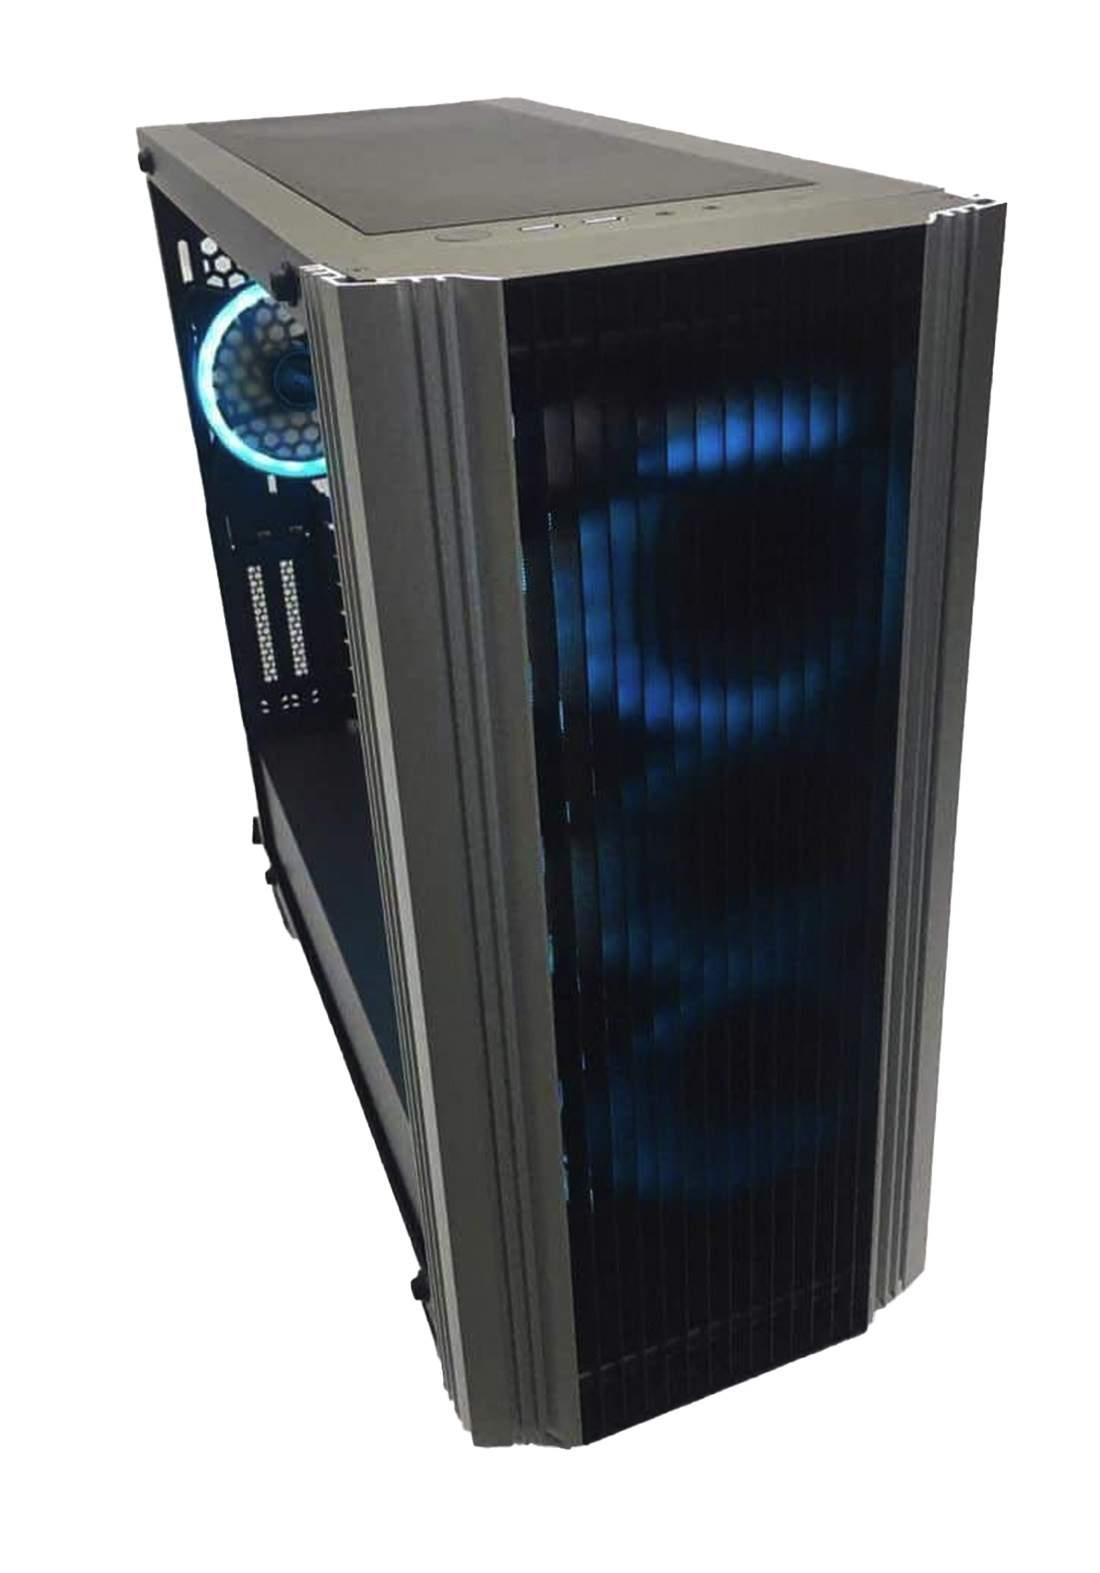 Aigo Darwin  Middle Tower Computer  Gaming Case - Black  كيس حاسبة